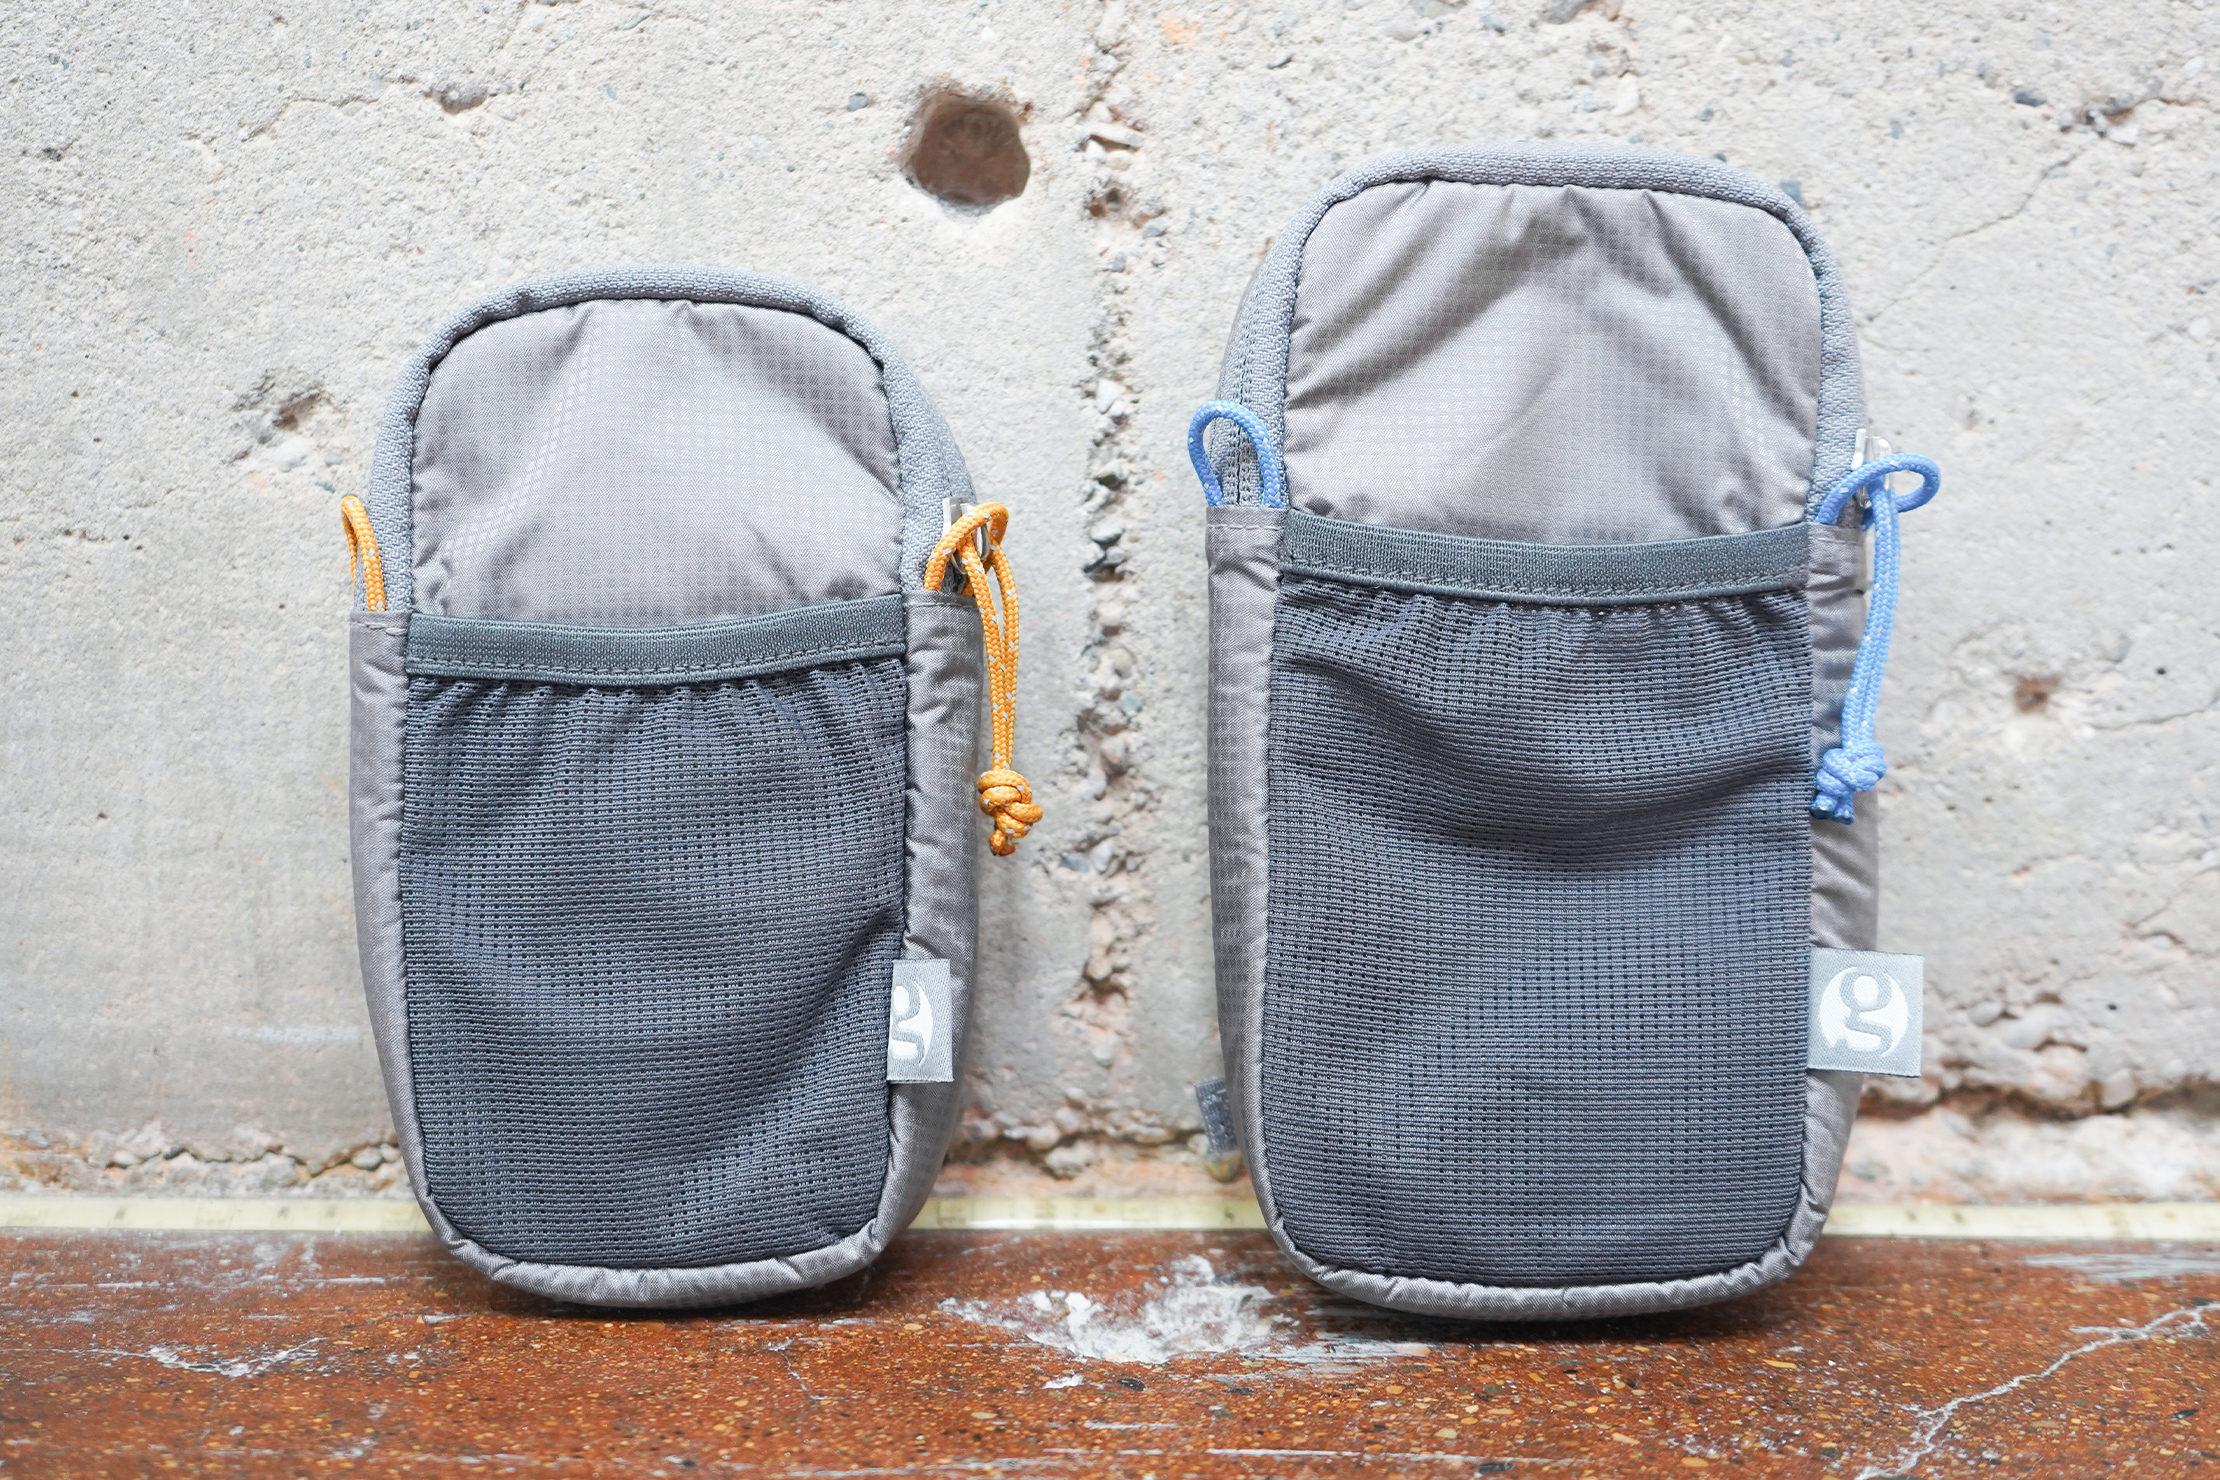 Gossamer Gear Shoulder Strap Pocket | The pouches side by side